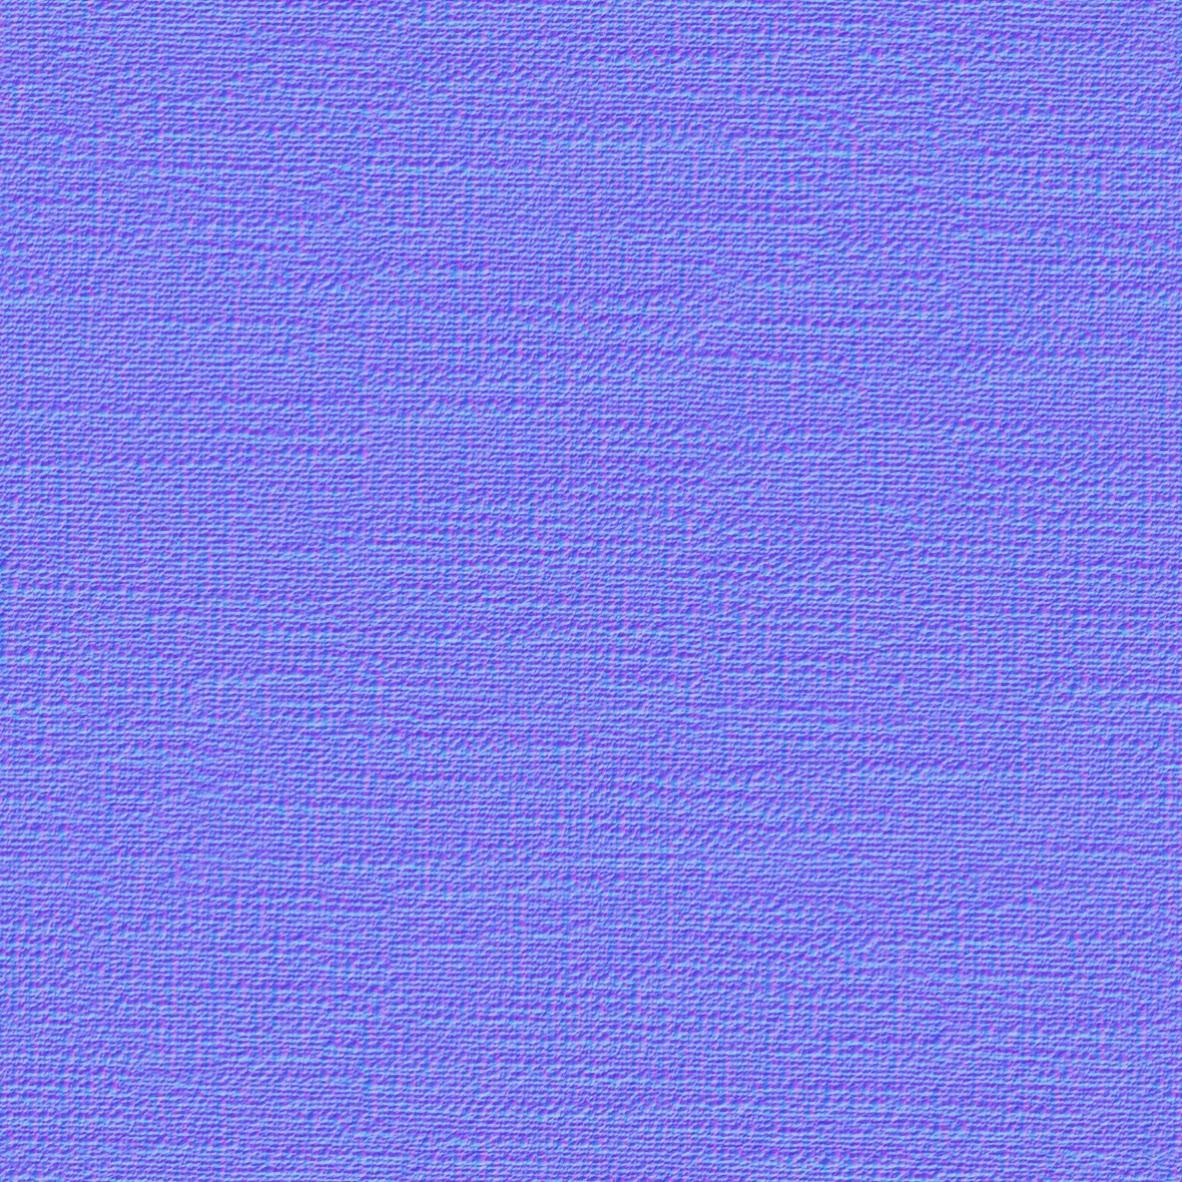 Seamless Brown Fabric Texture Maps Texturise Free